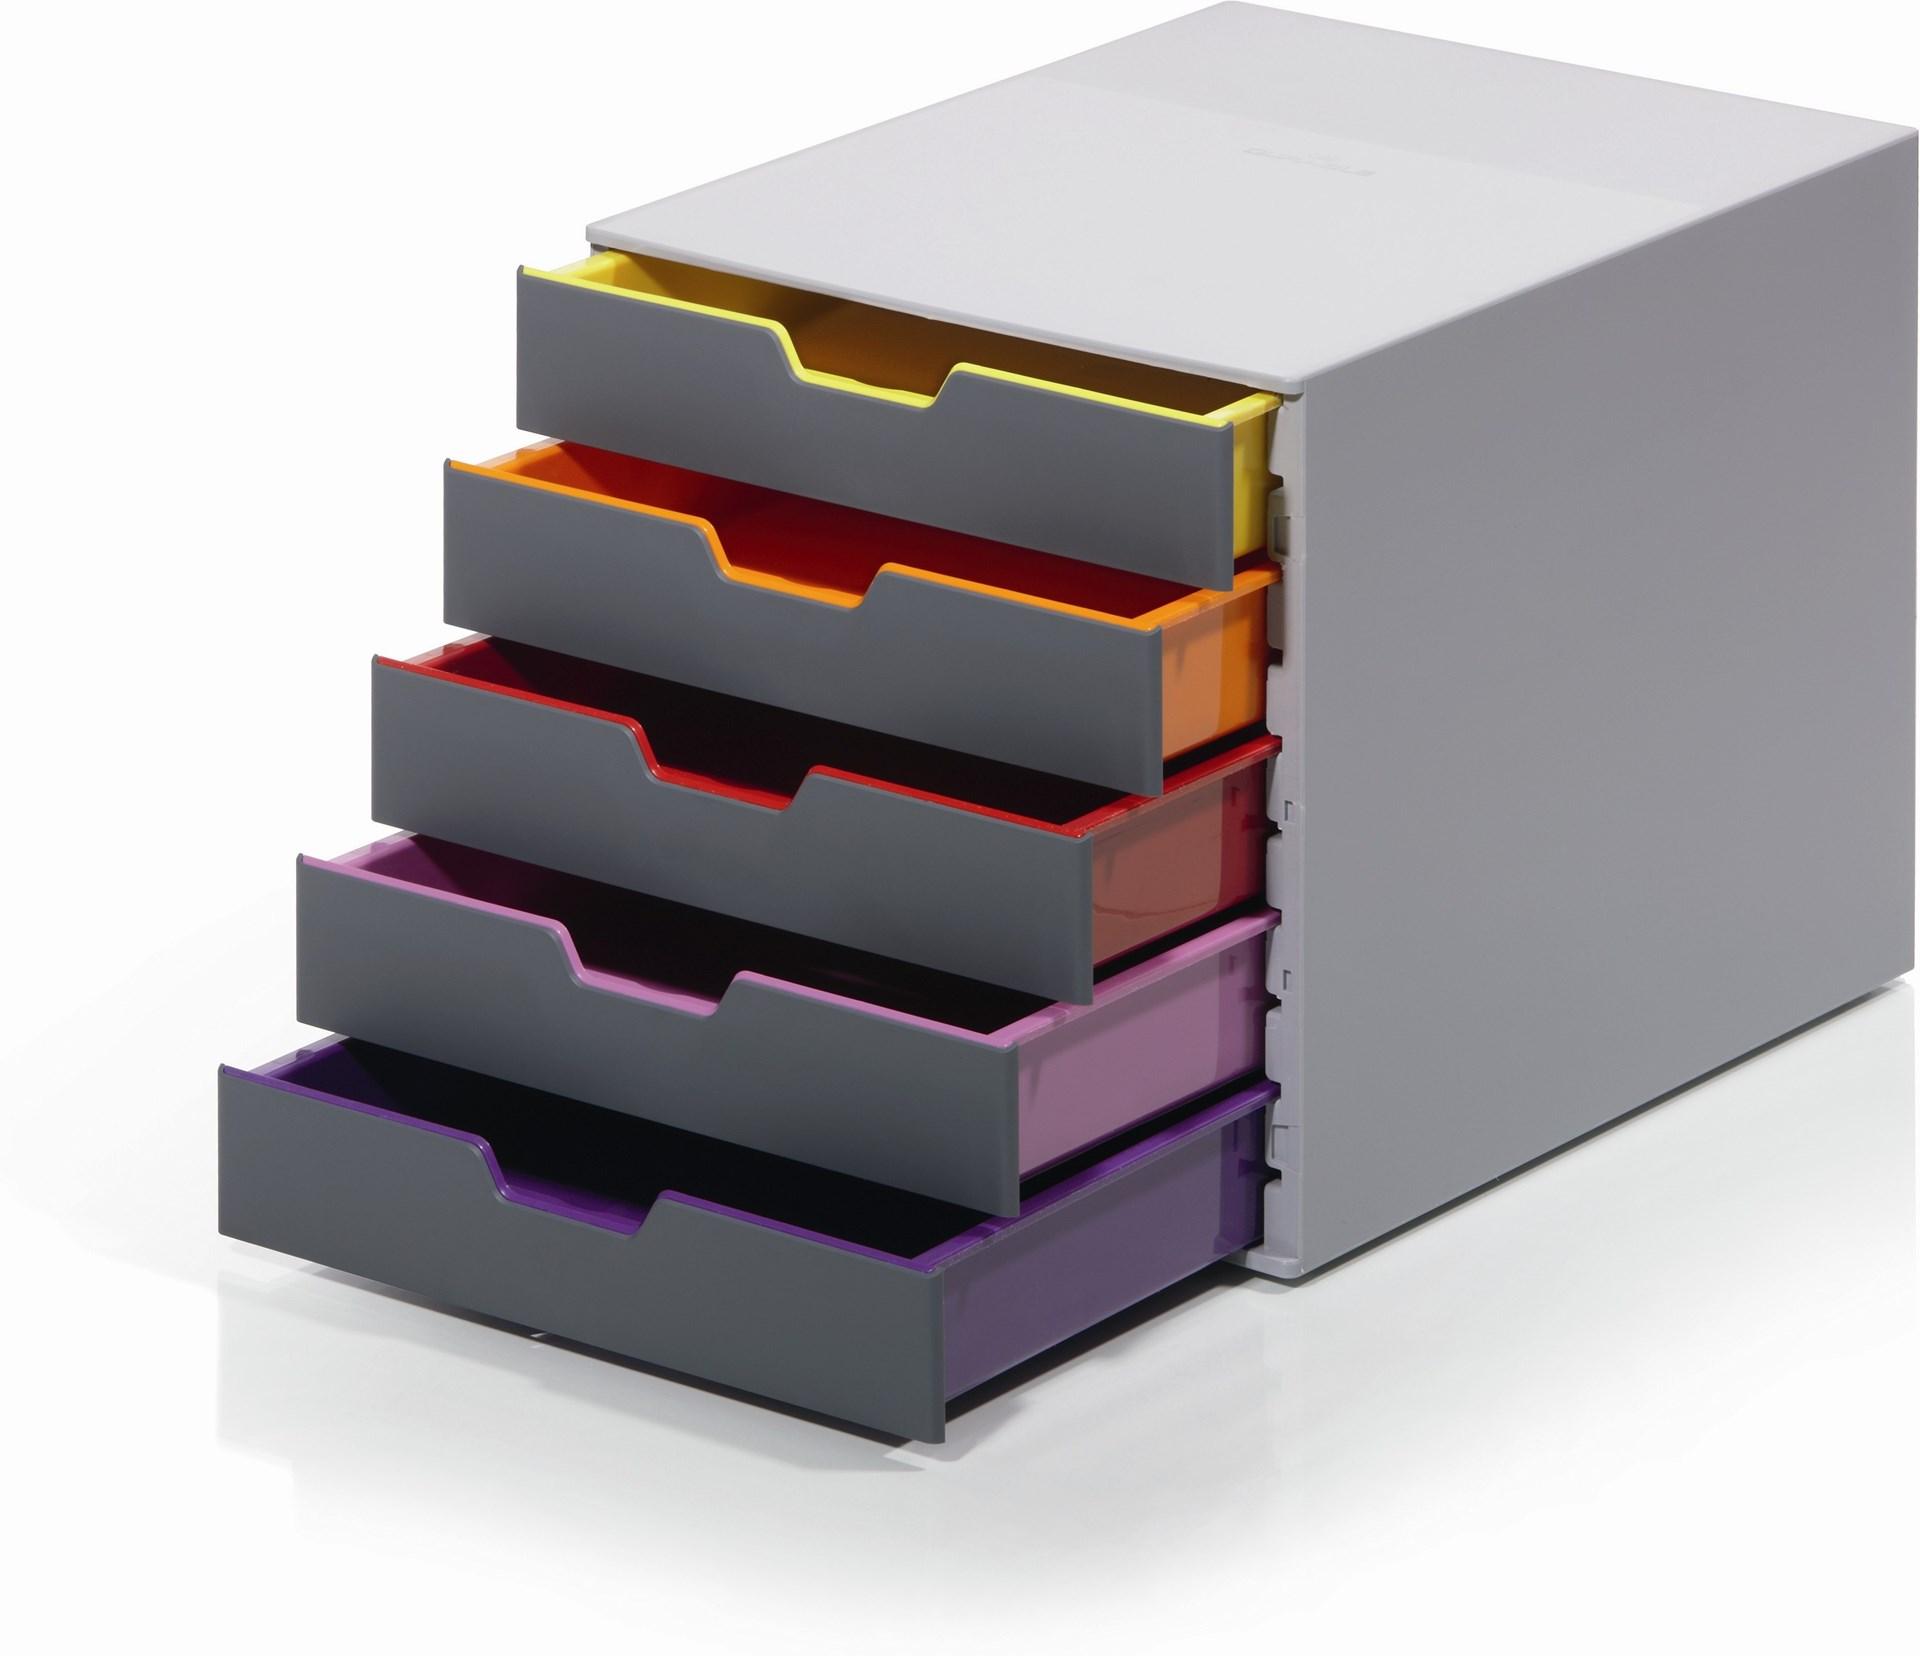 Durable varicolor 5 blankettbox varicolor 5 for Ladenblok durable varicolor